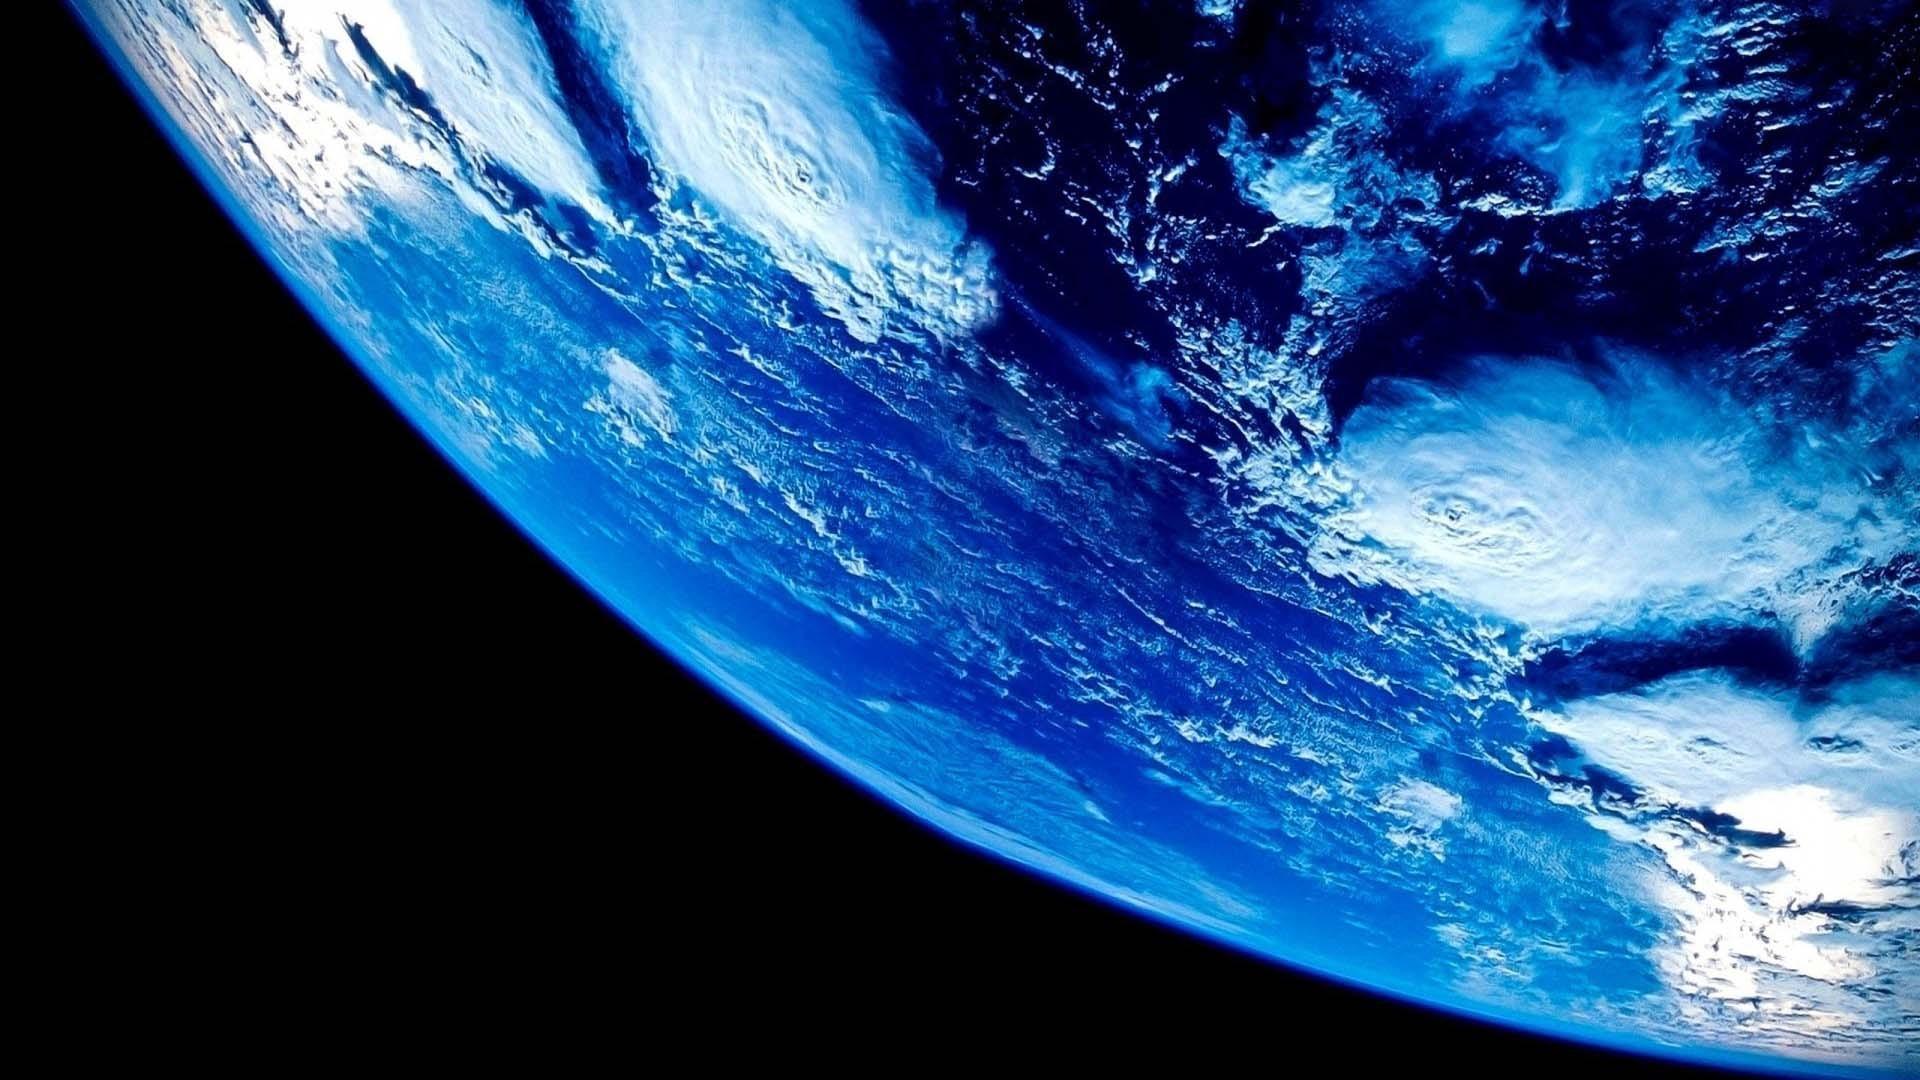 Fondos de pantalla de la Tierra ak